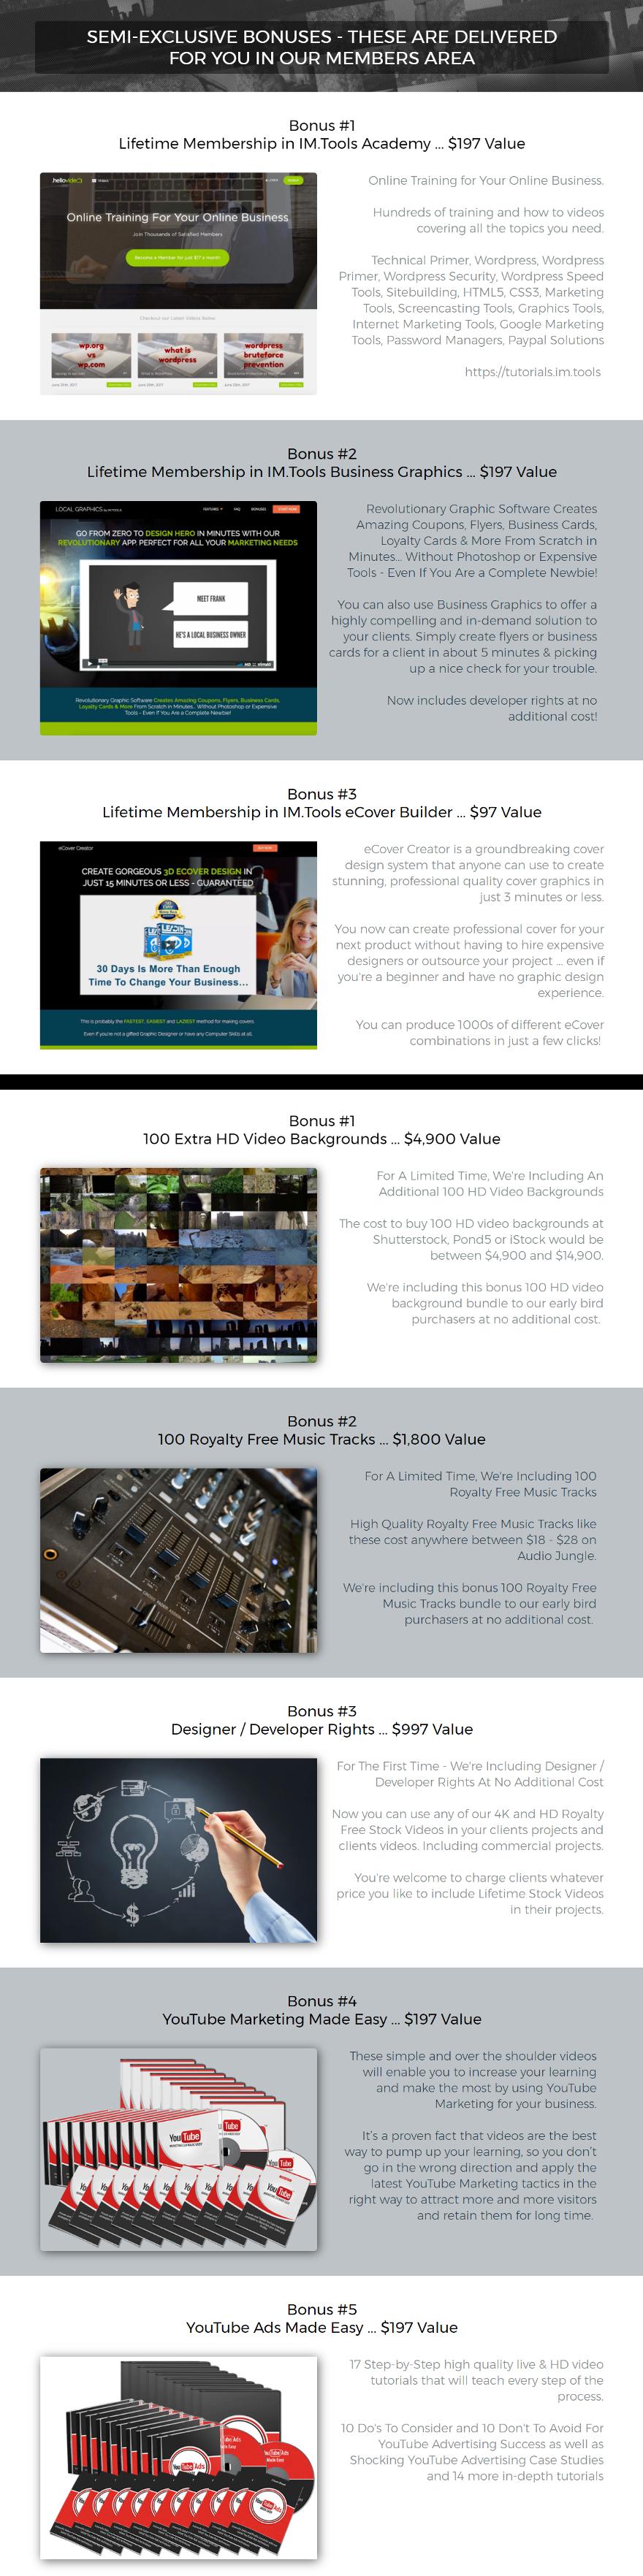 Lifetime Stock Video Bonuses